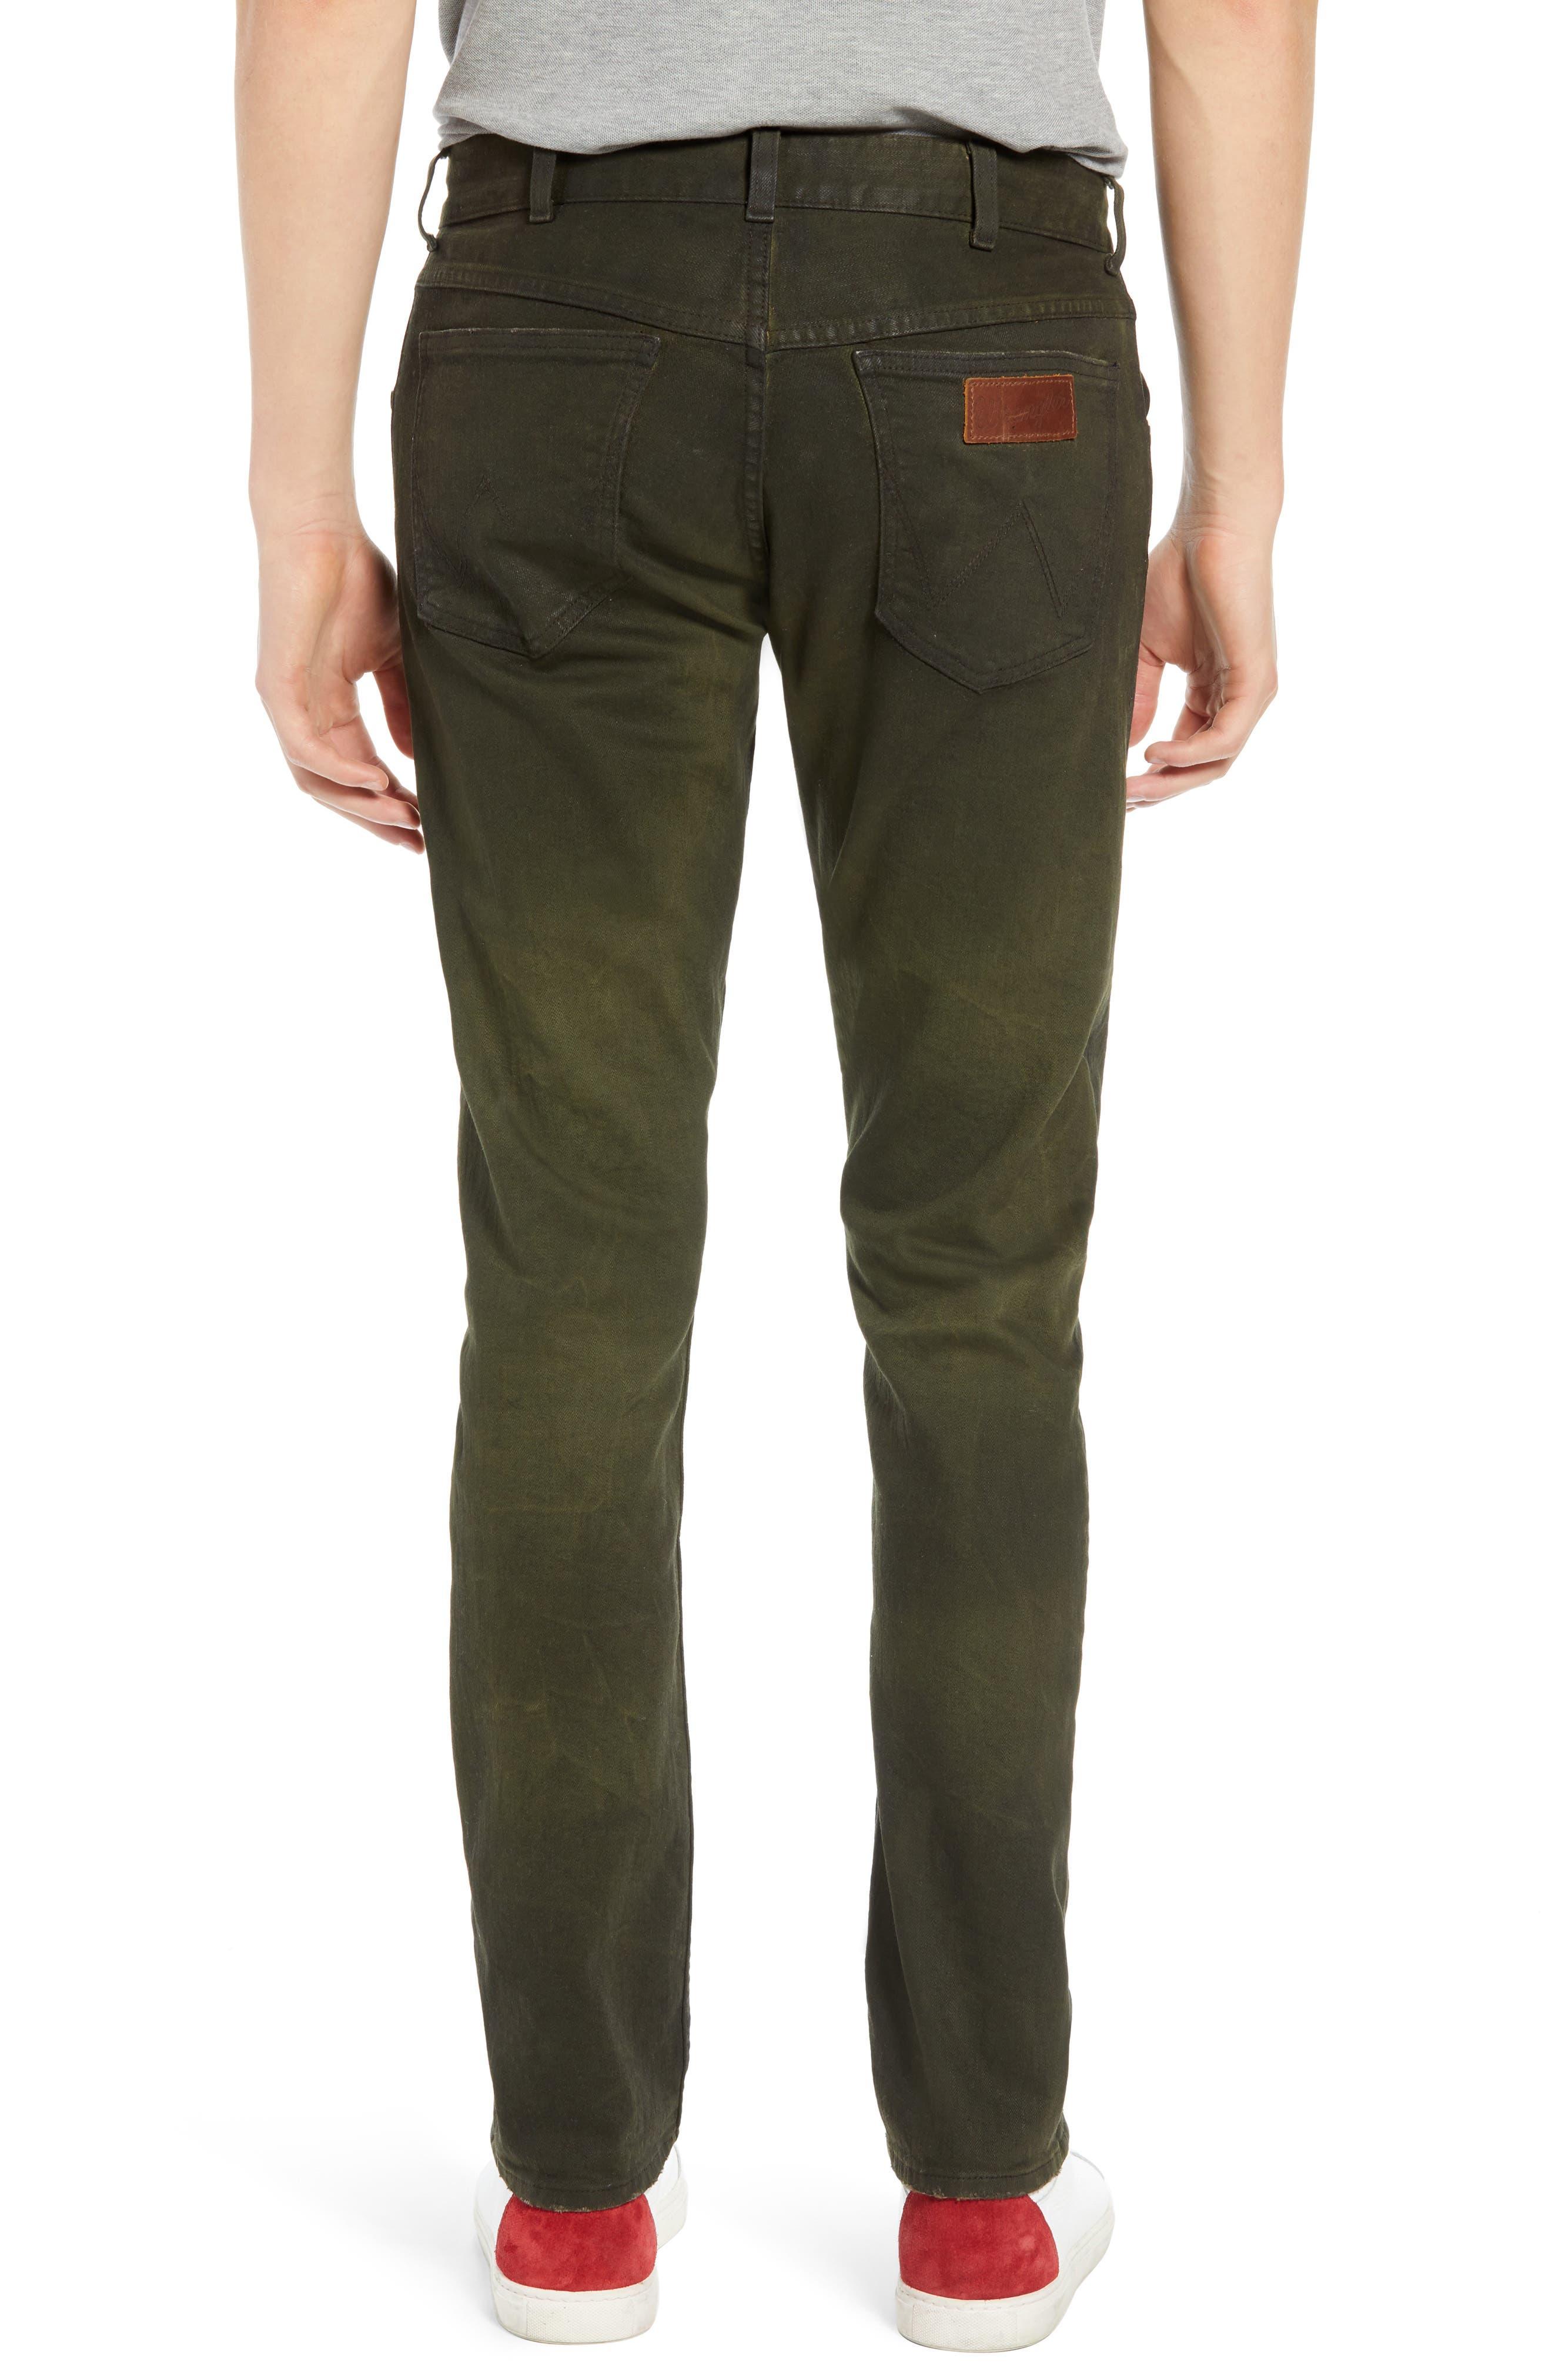 Larston Slim Fit Jeans,                             Alternate thumbnail 2, color,                             ROVER GREEN